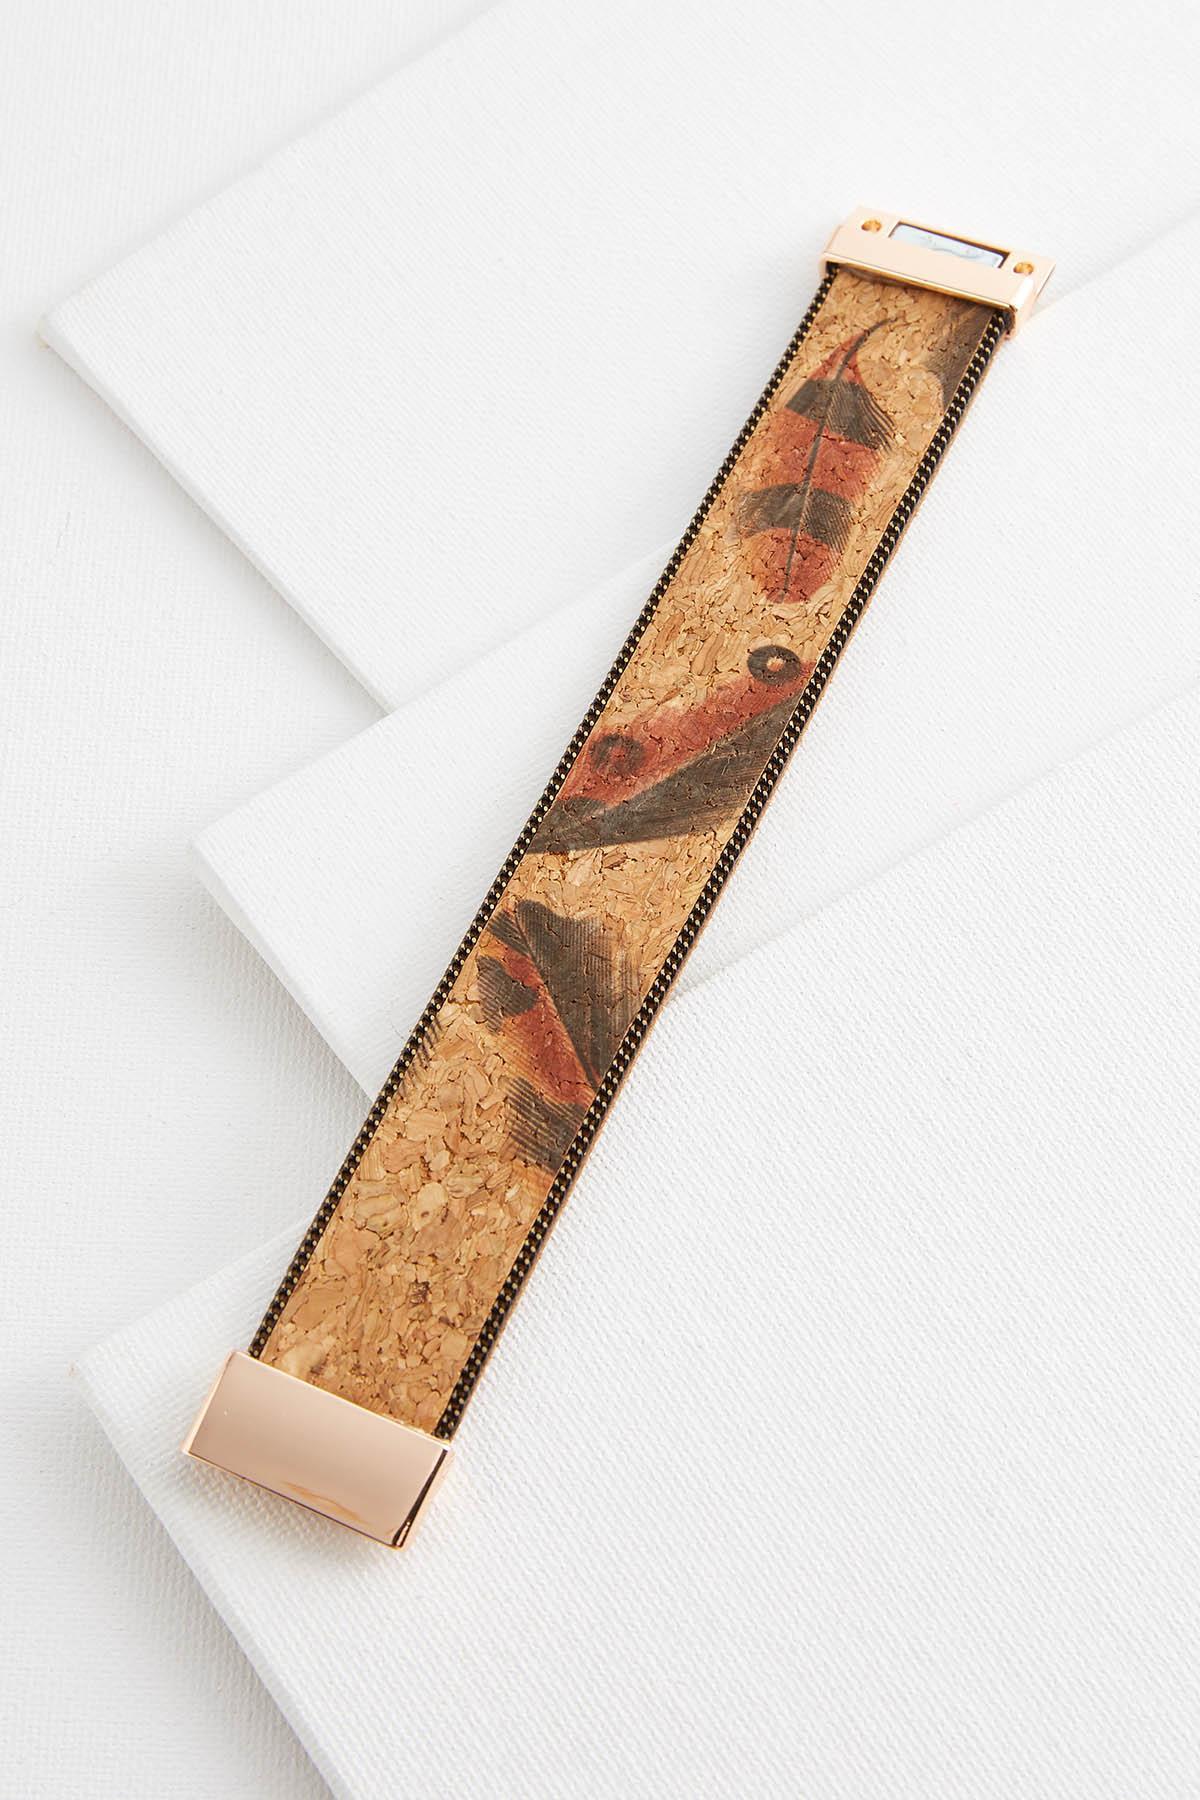 Feather Cork Bracelet